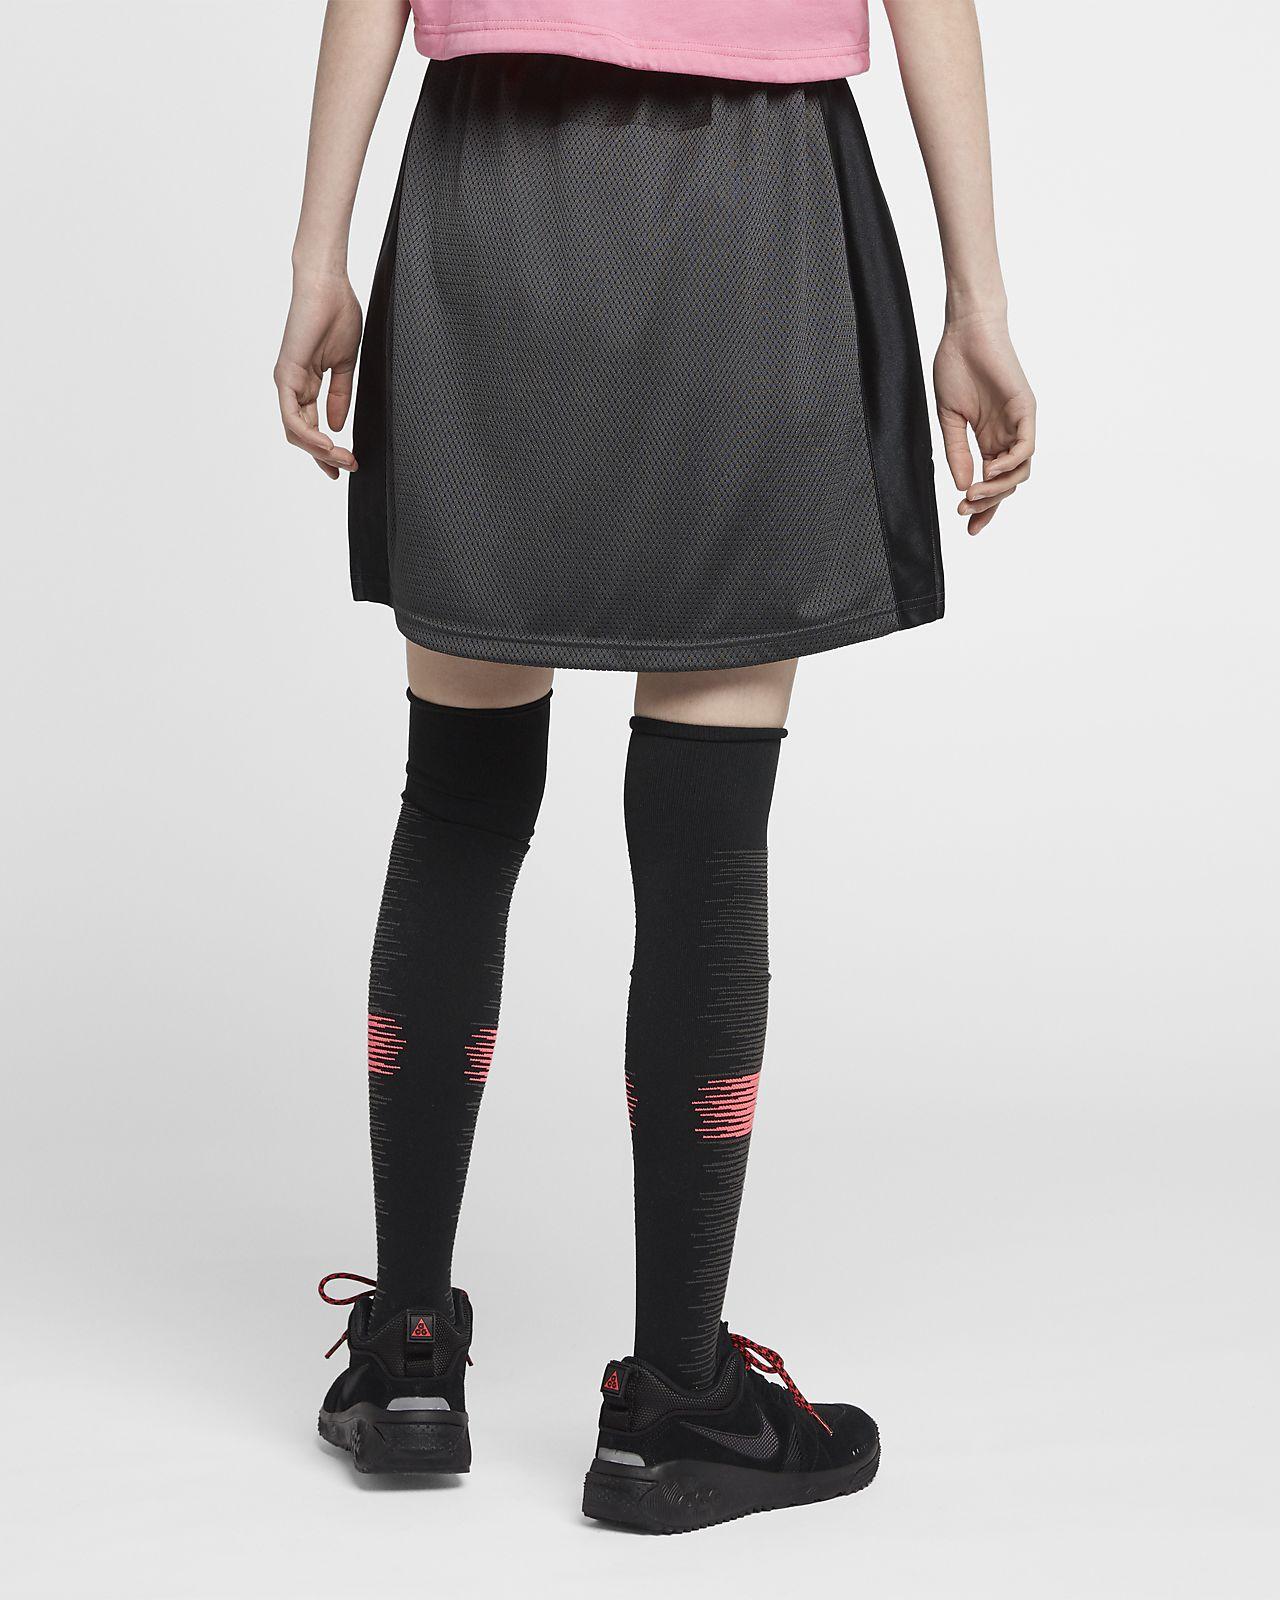 più amato 69ad9 2a72b Gonna da football americano NikeLab Collection - Donna. Nike IT